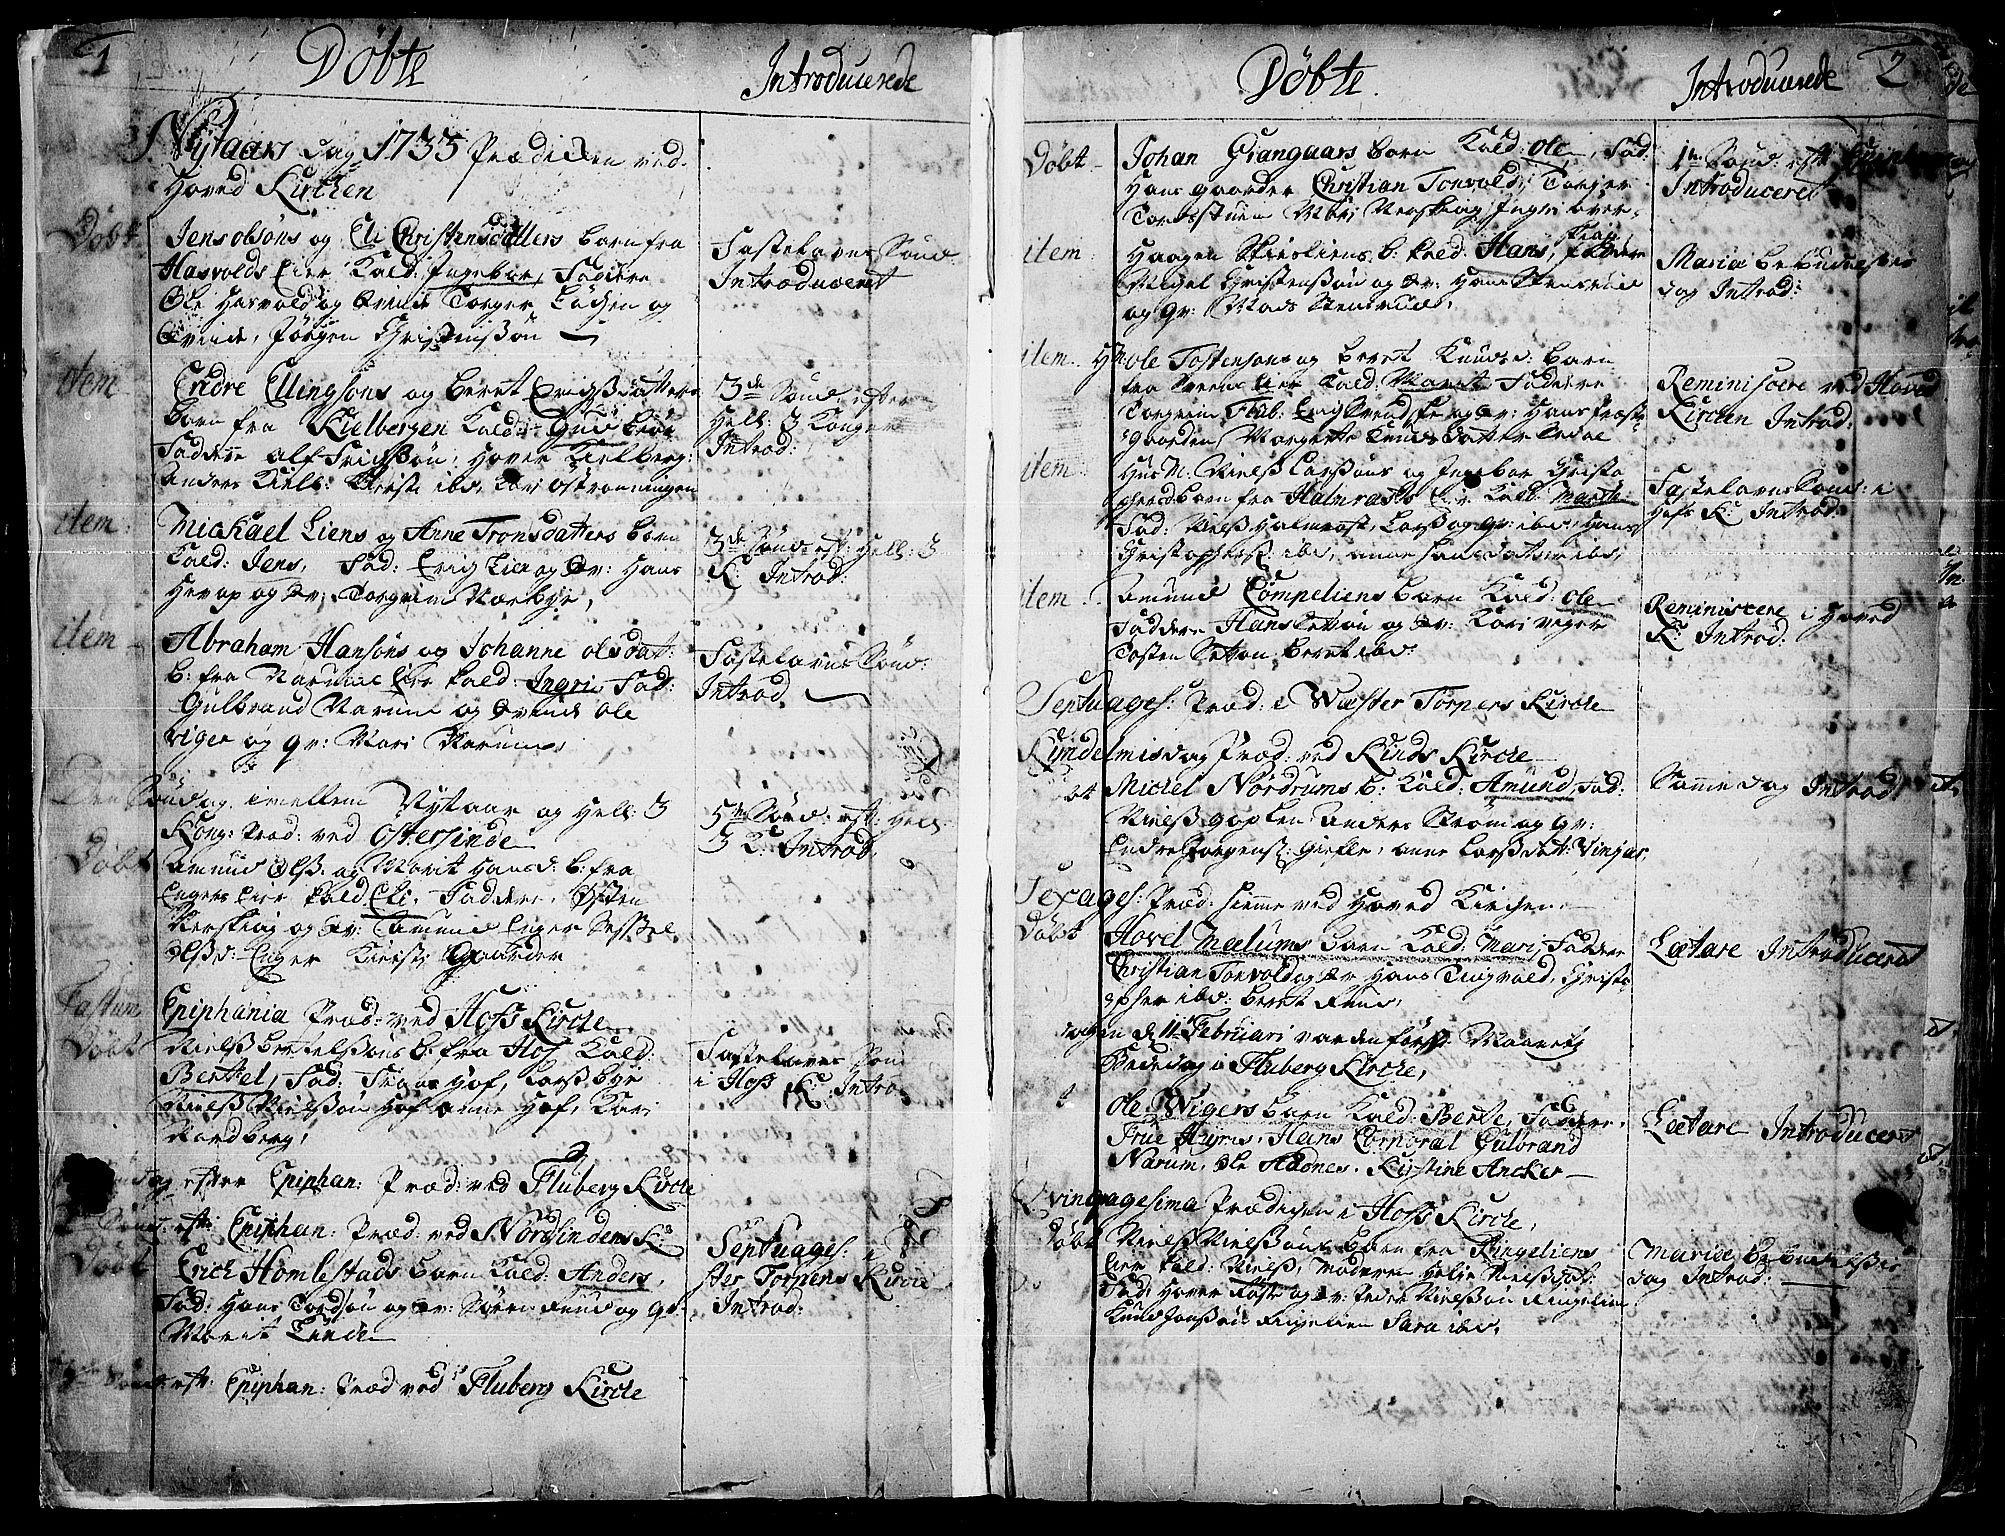 SAH, Land prestekontor, Ministerialbok nr. 2, 1733-1764, s. 1-2